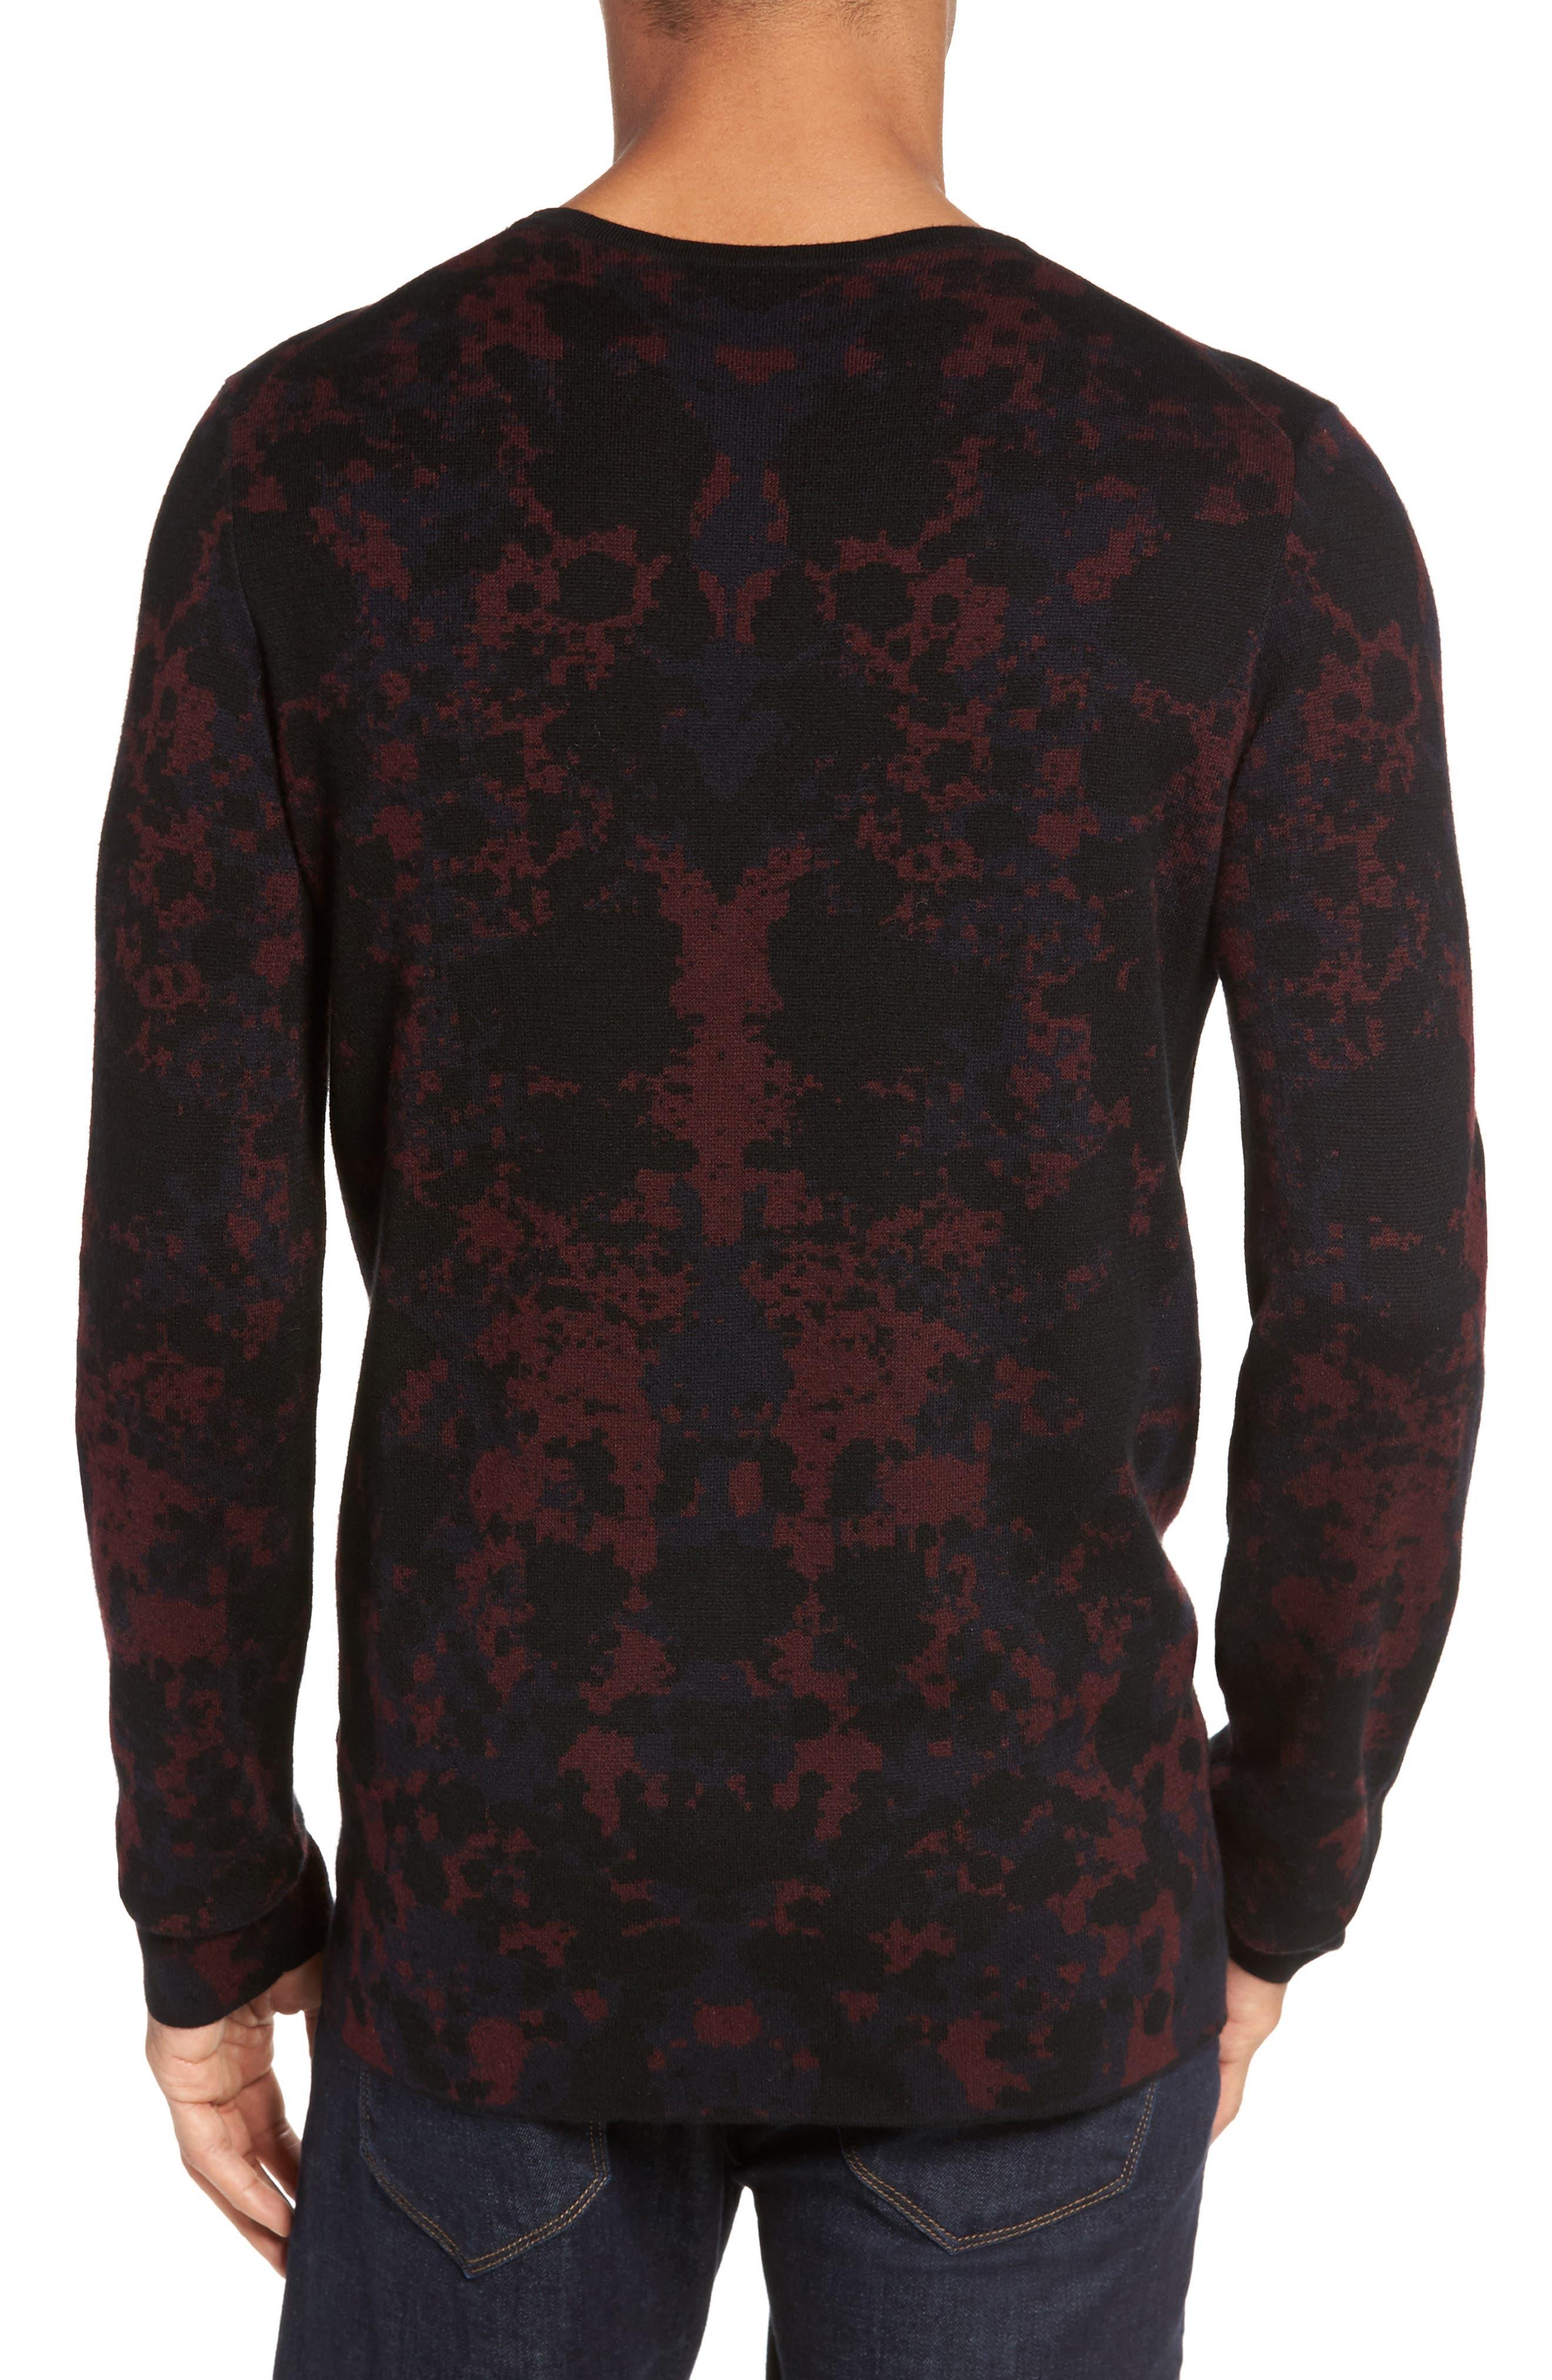 HUGO Sorach Print Slim Fit Sweater,                             Alternate thumbnail 2, color,                             Red